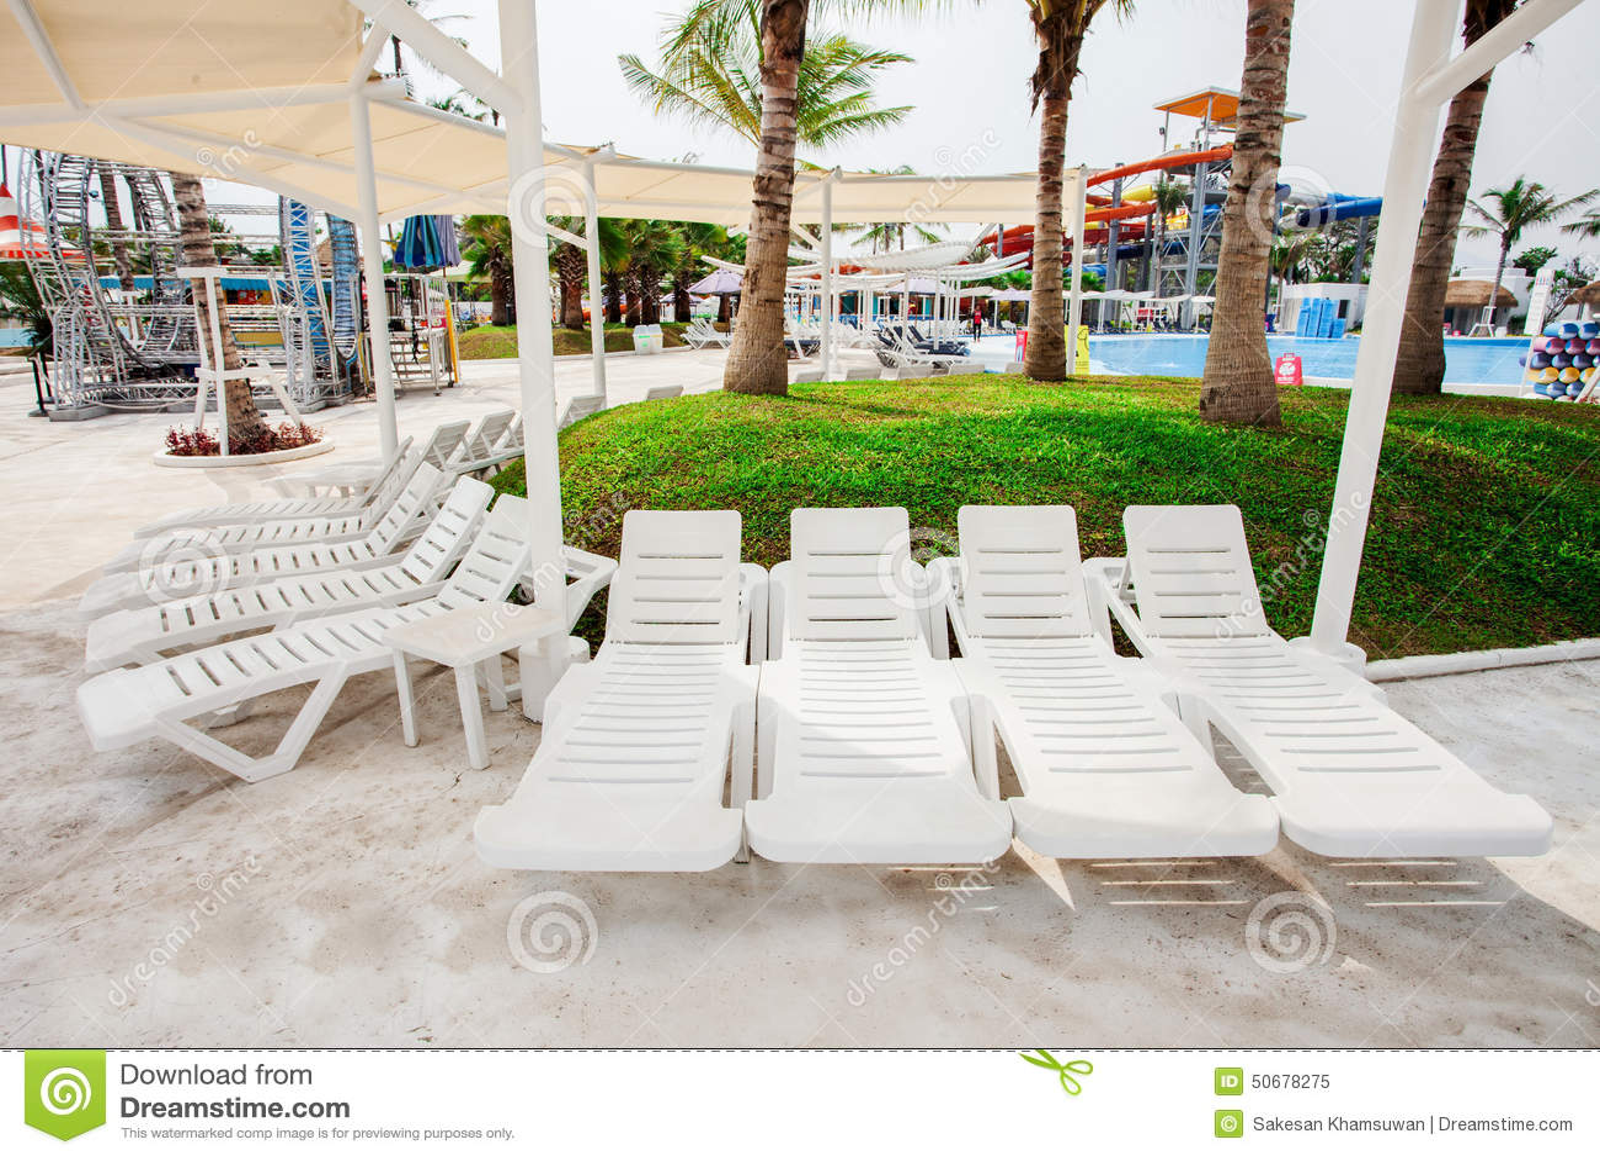 Download 白色海滩柴 库存图片. 图片 包括有 对象, 孑然, 海景, 蓝色, 放松, 人们, 处女, 气候, 边缘 - 50678275